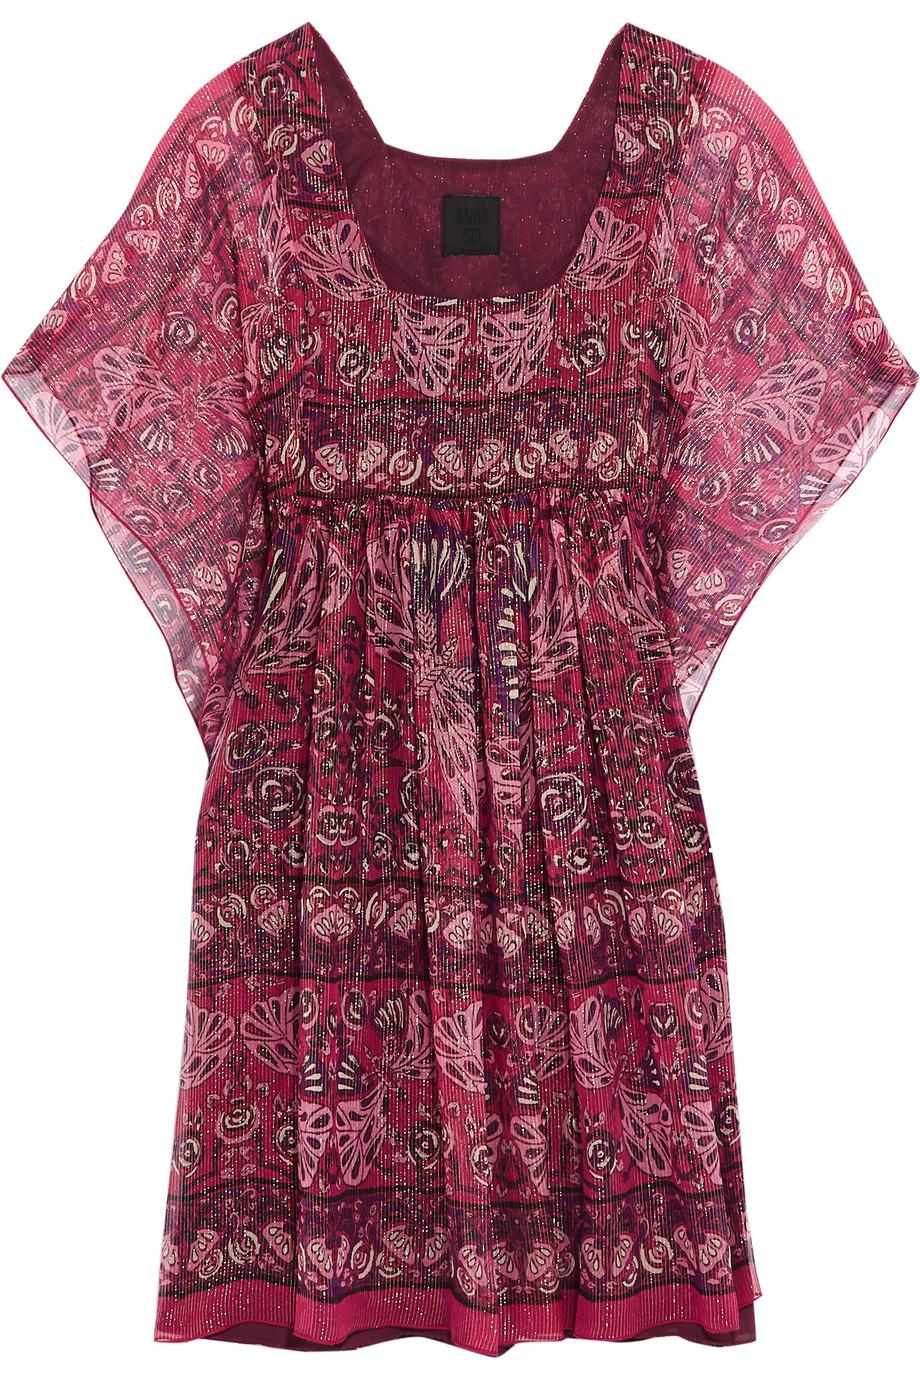 Anna Sui Lamé-Striped Printed Silk-Blend Mini Dress, Pink/Purple, Women's - Printed, Size: 2